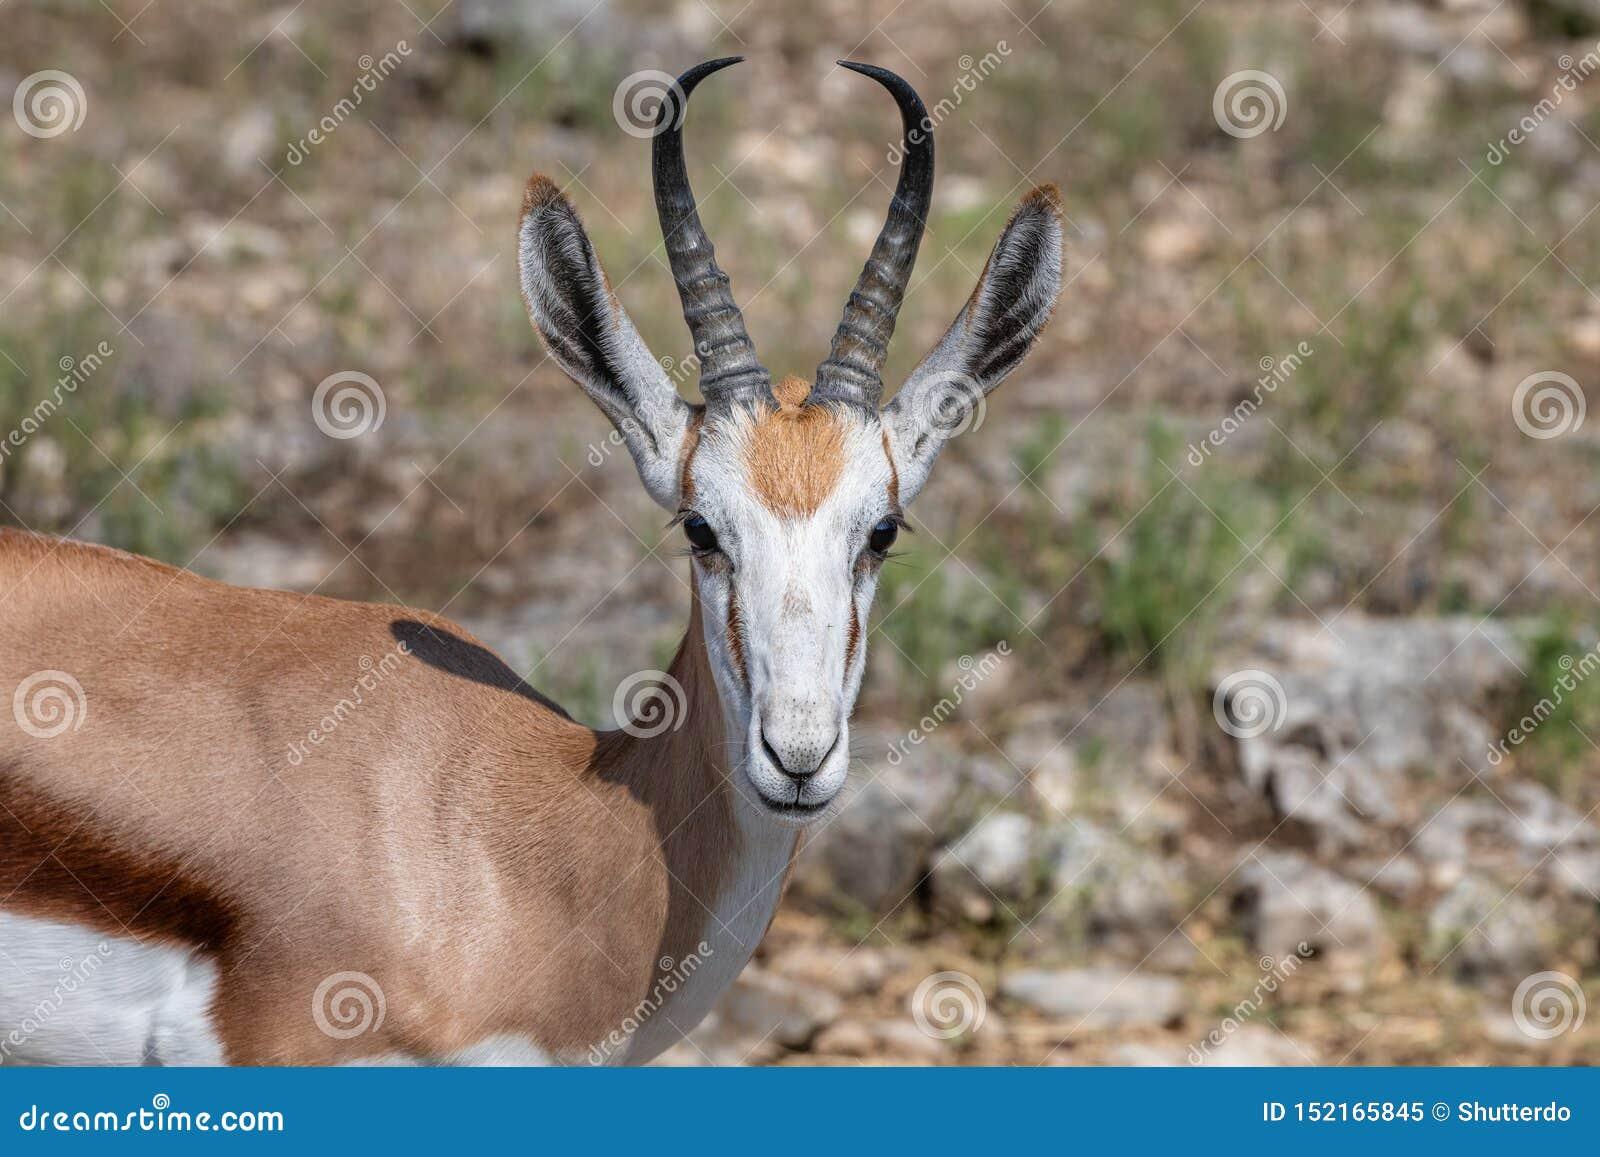 Closeup of a springbok antelope head and shoulder